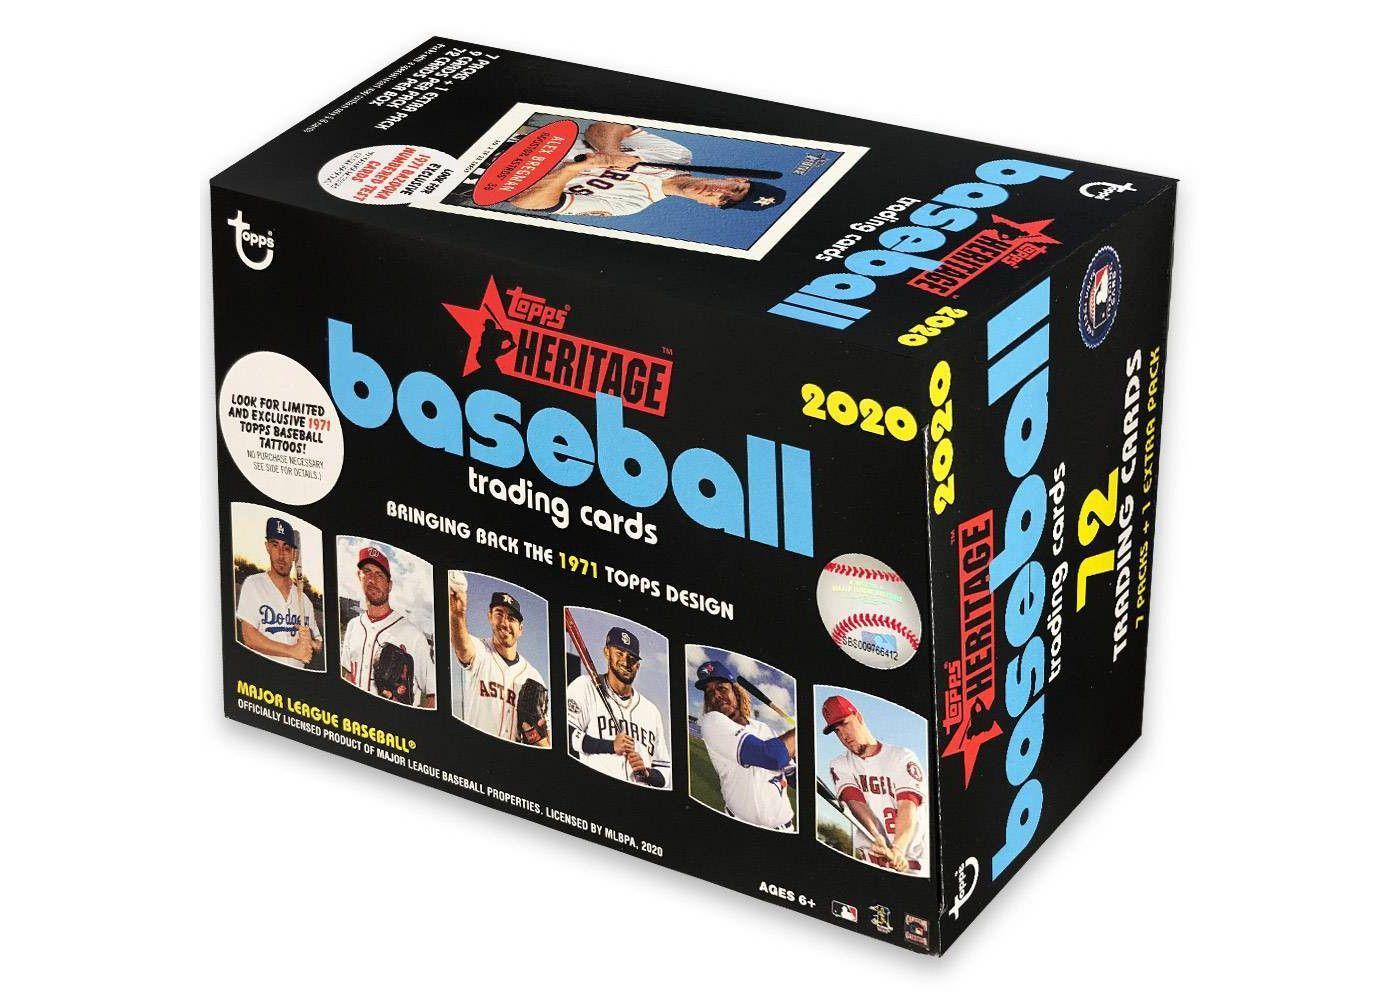 Topps 2020 Heritage Baseball Trading Card Blaster Box in